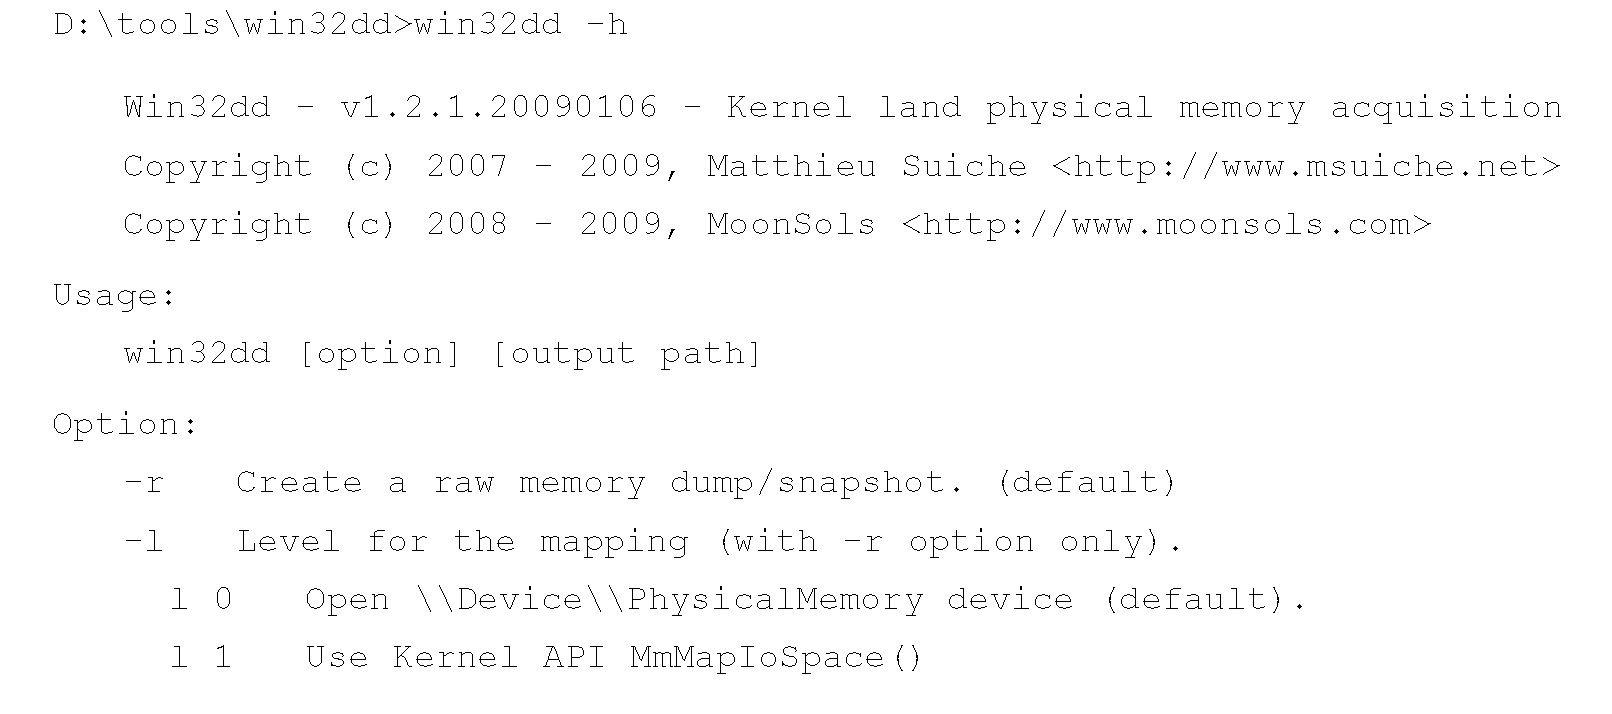 Windows Memory Analysis (Windows Forensic Analysis) Part 1